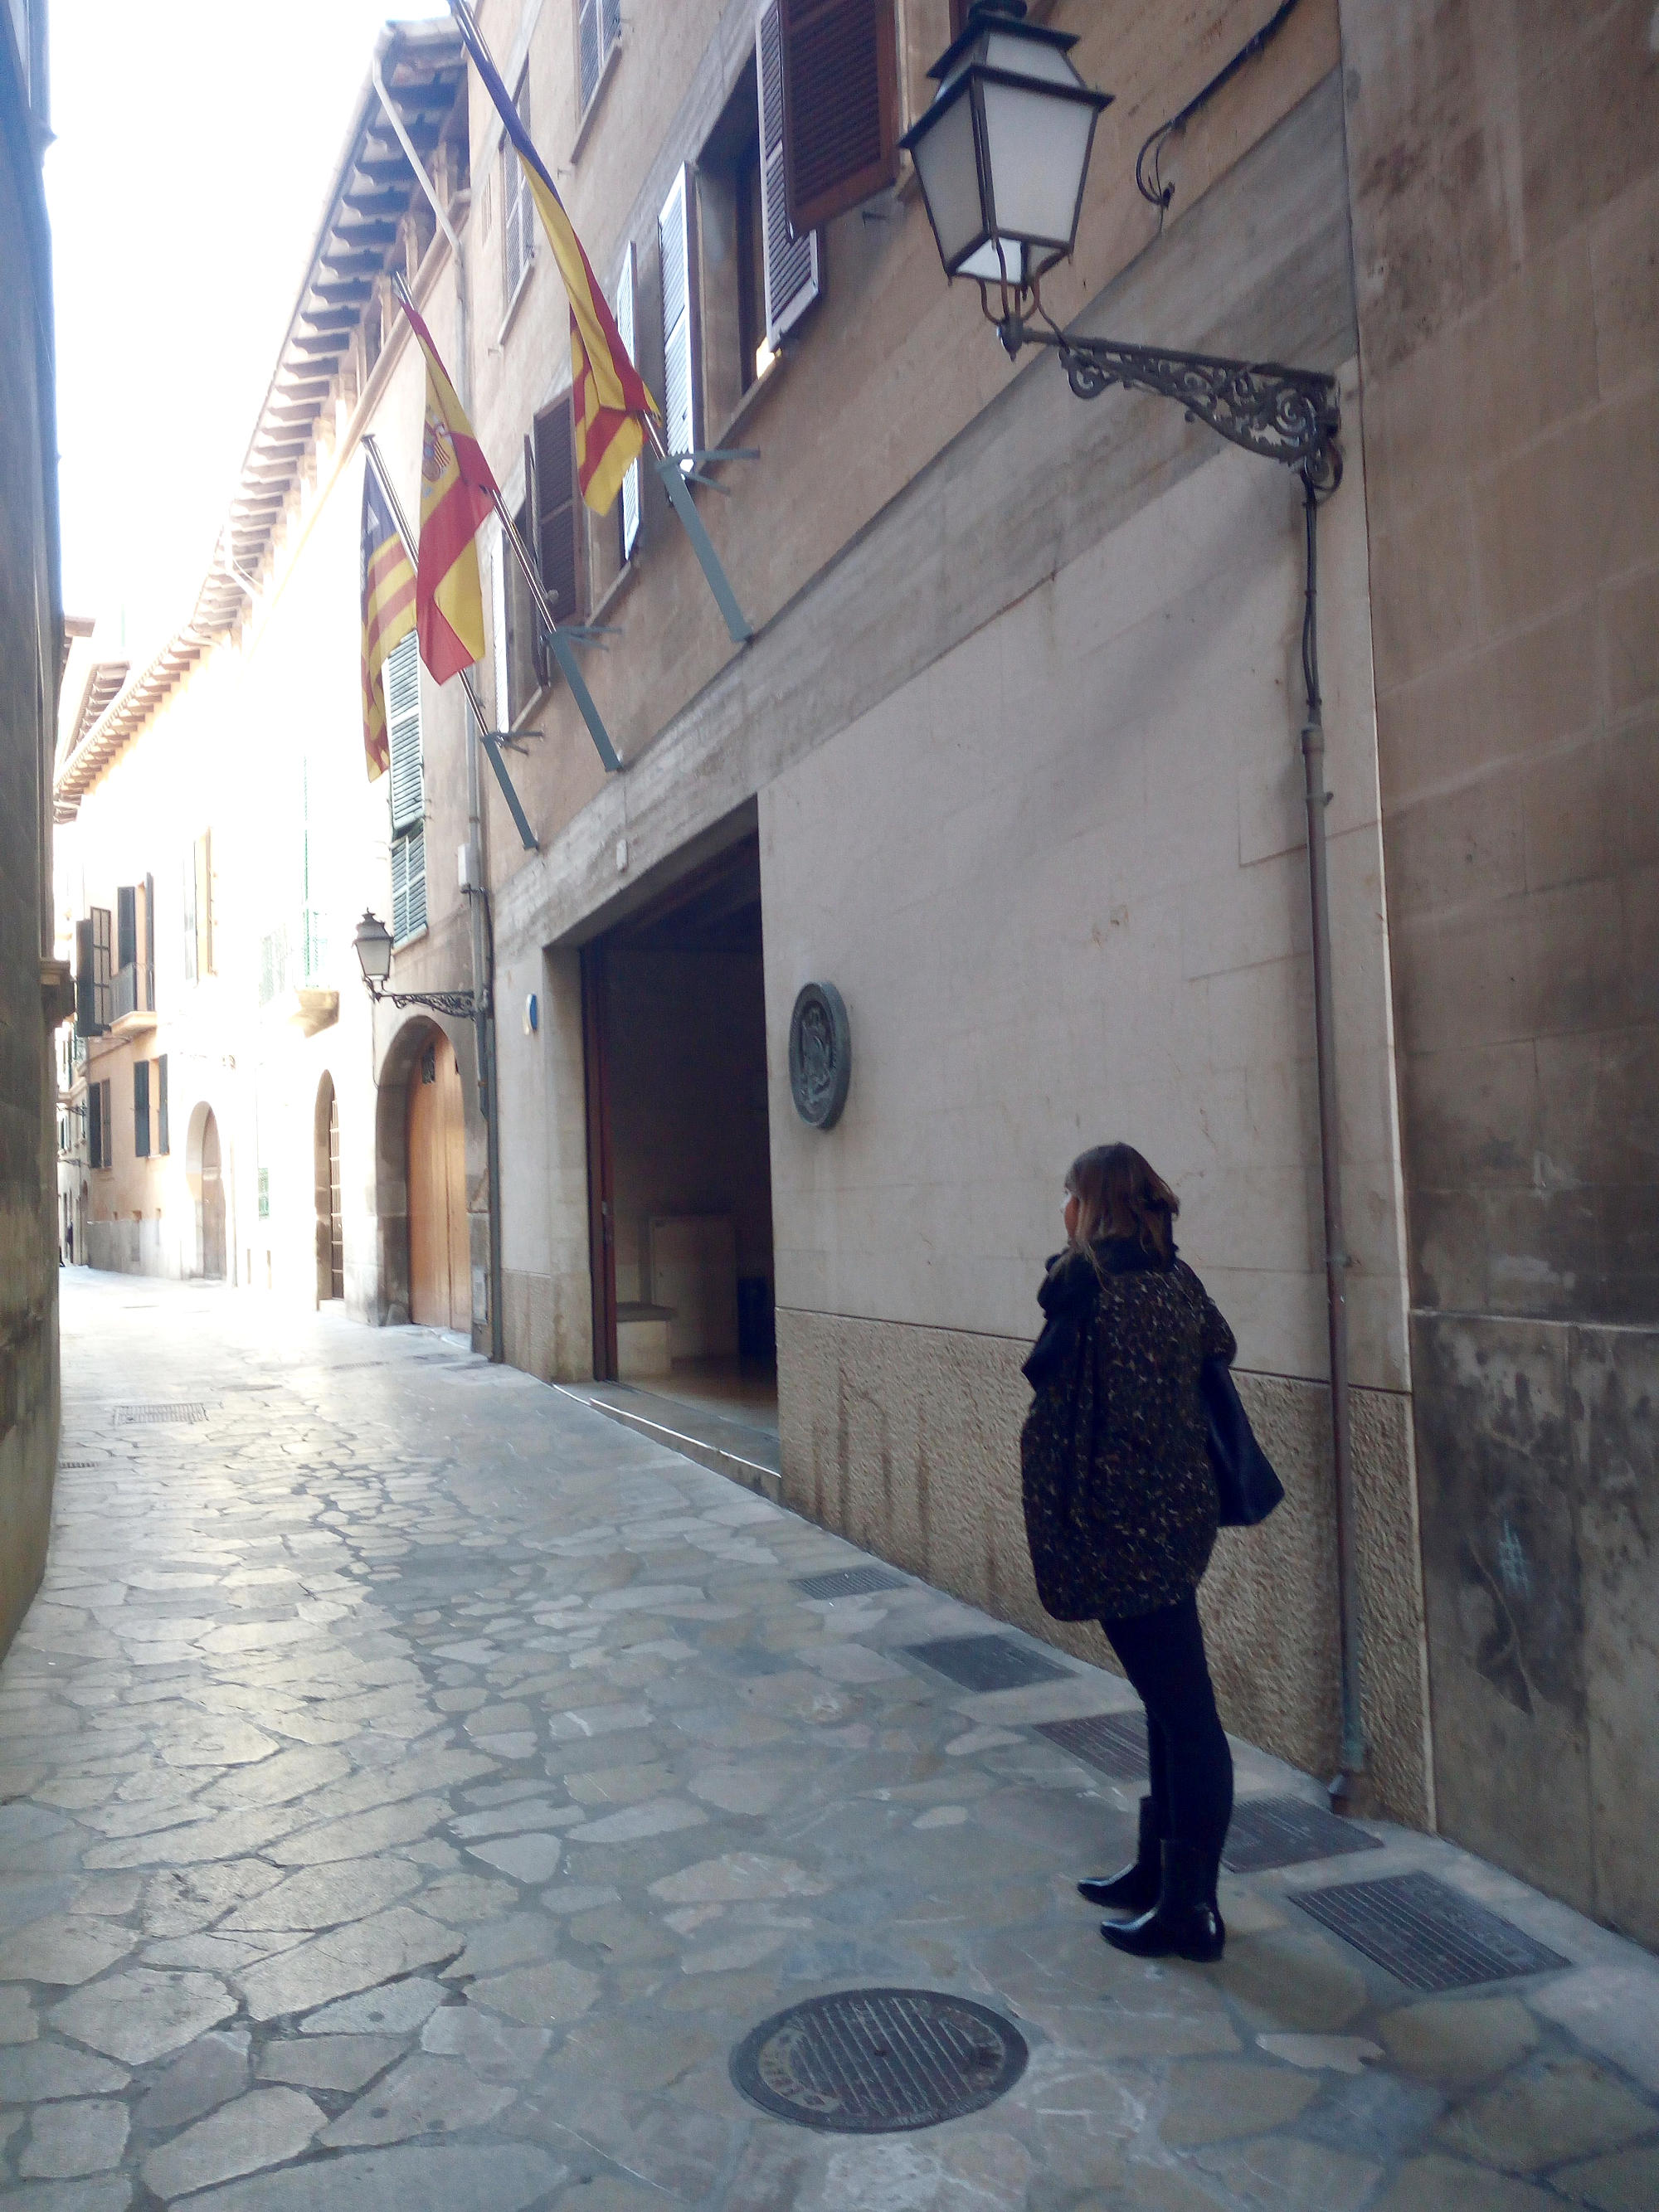 Frau alleine in Gasse in Mallorca